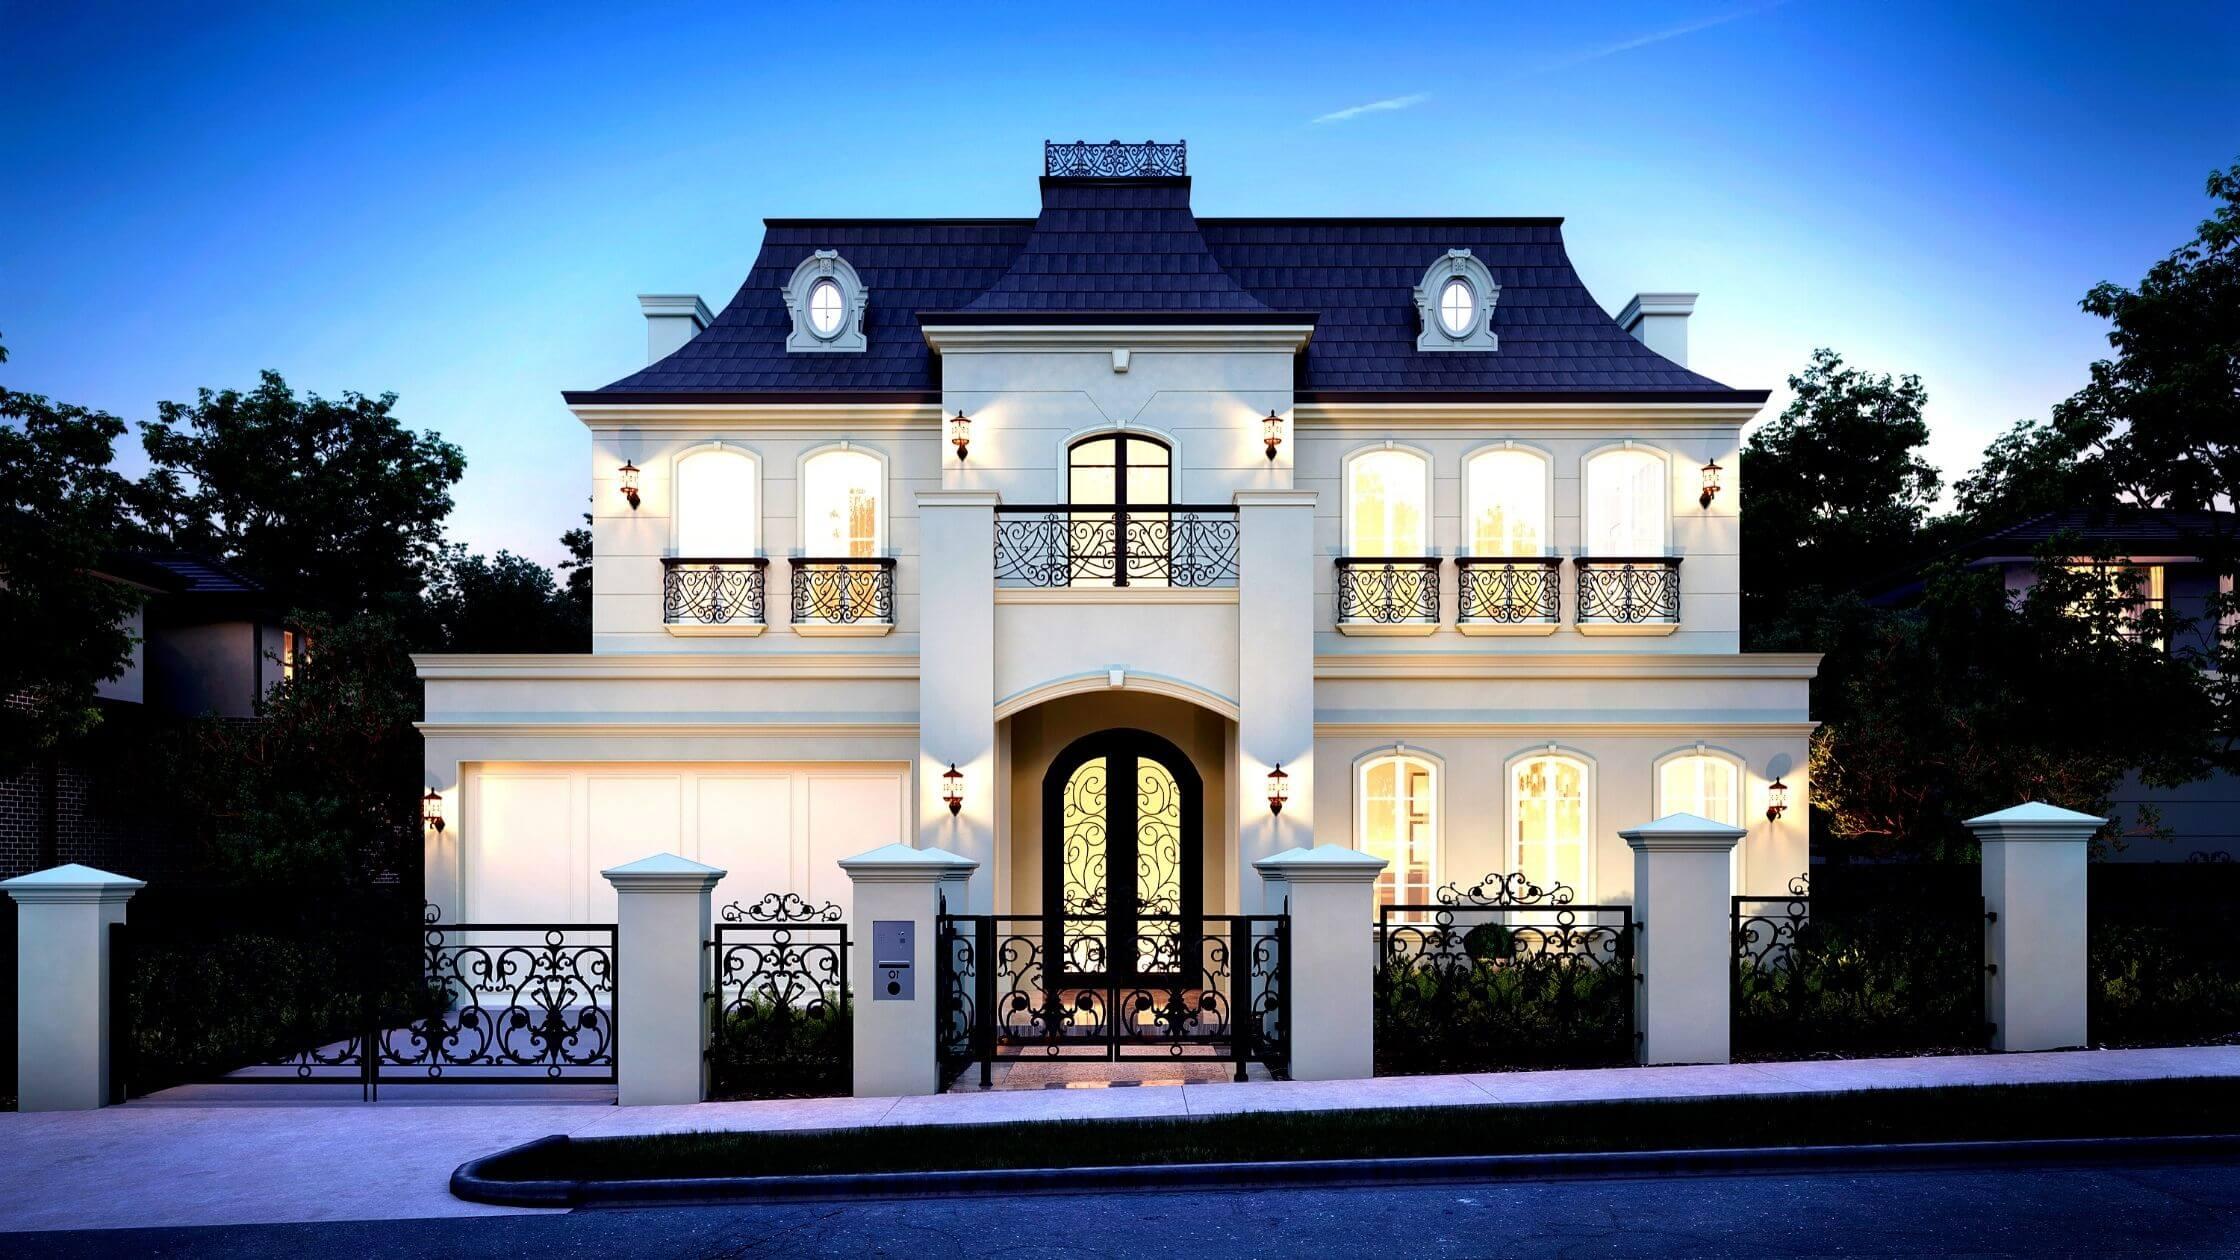 Home Design Images | House Design